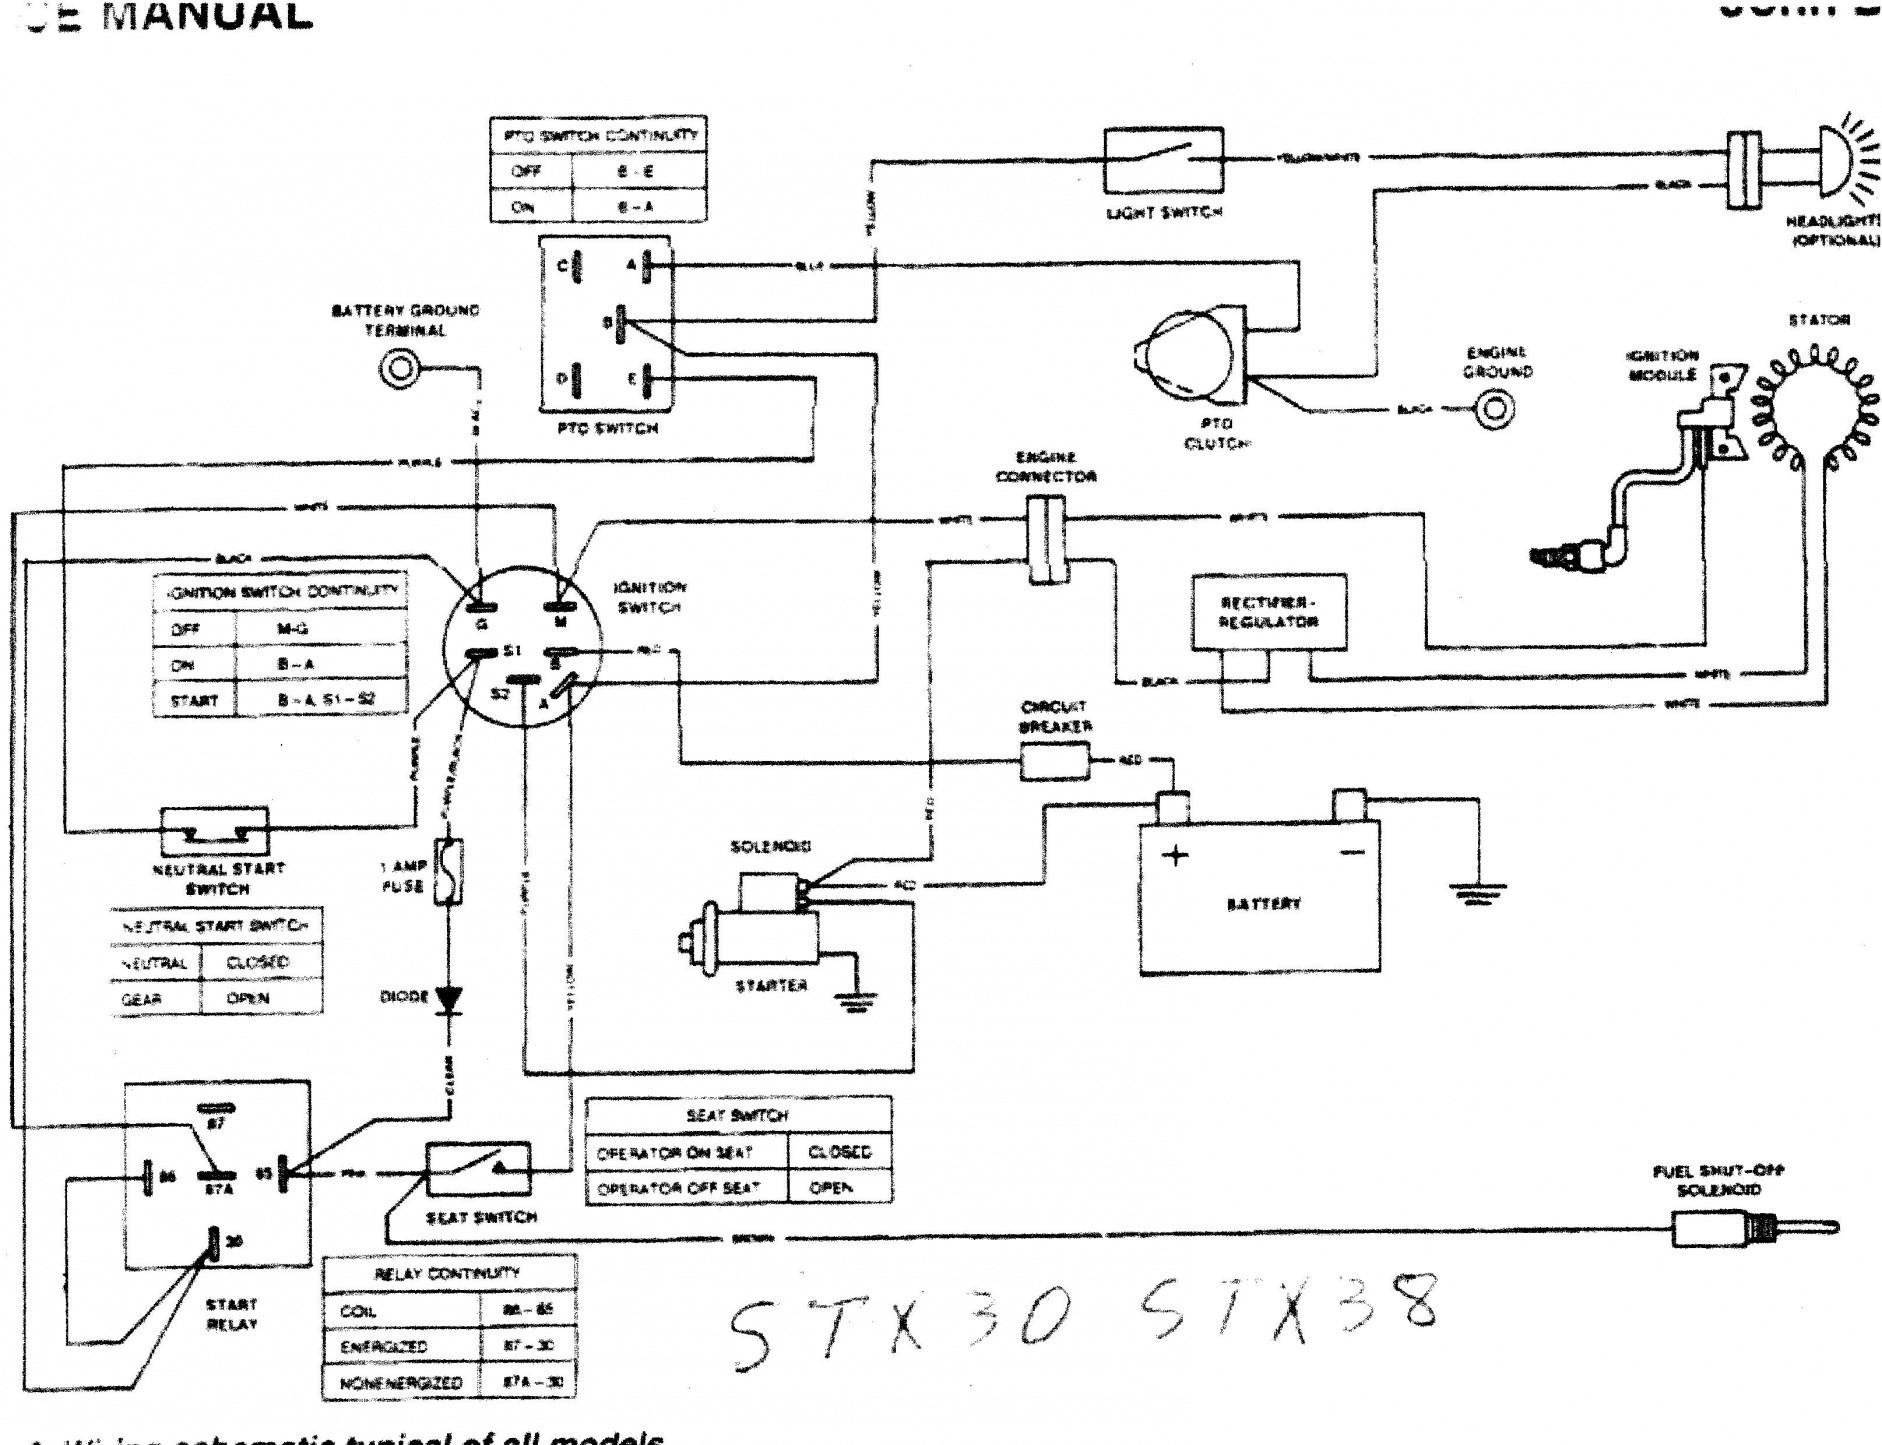 WA_2254] Wiring John Deere Ignition Wiring John Deere Z225 Wiring Diagram  Download DiagramPonol Hapolo Mohammedshrine Librar Wiring 101